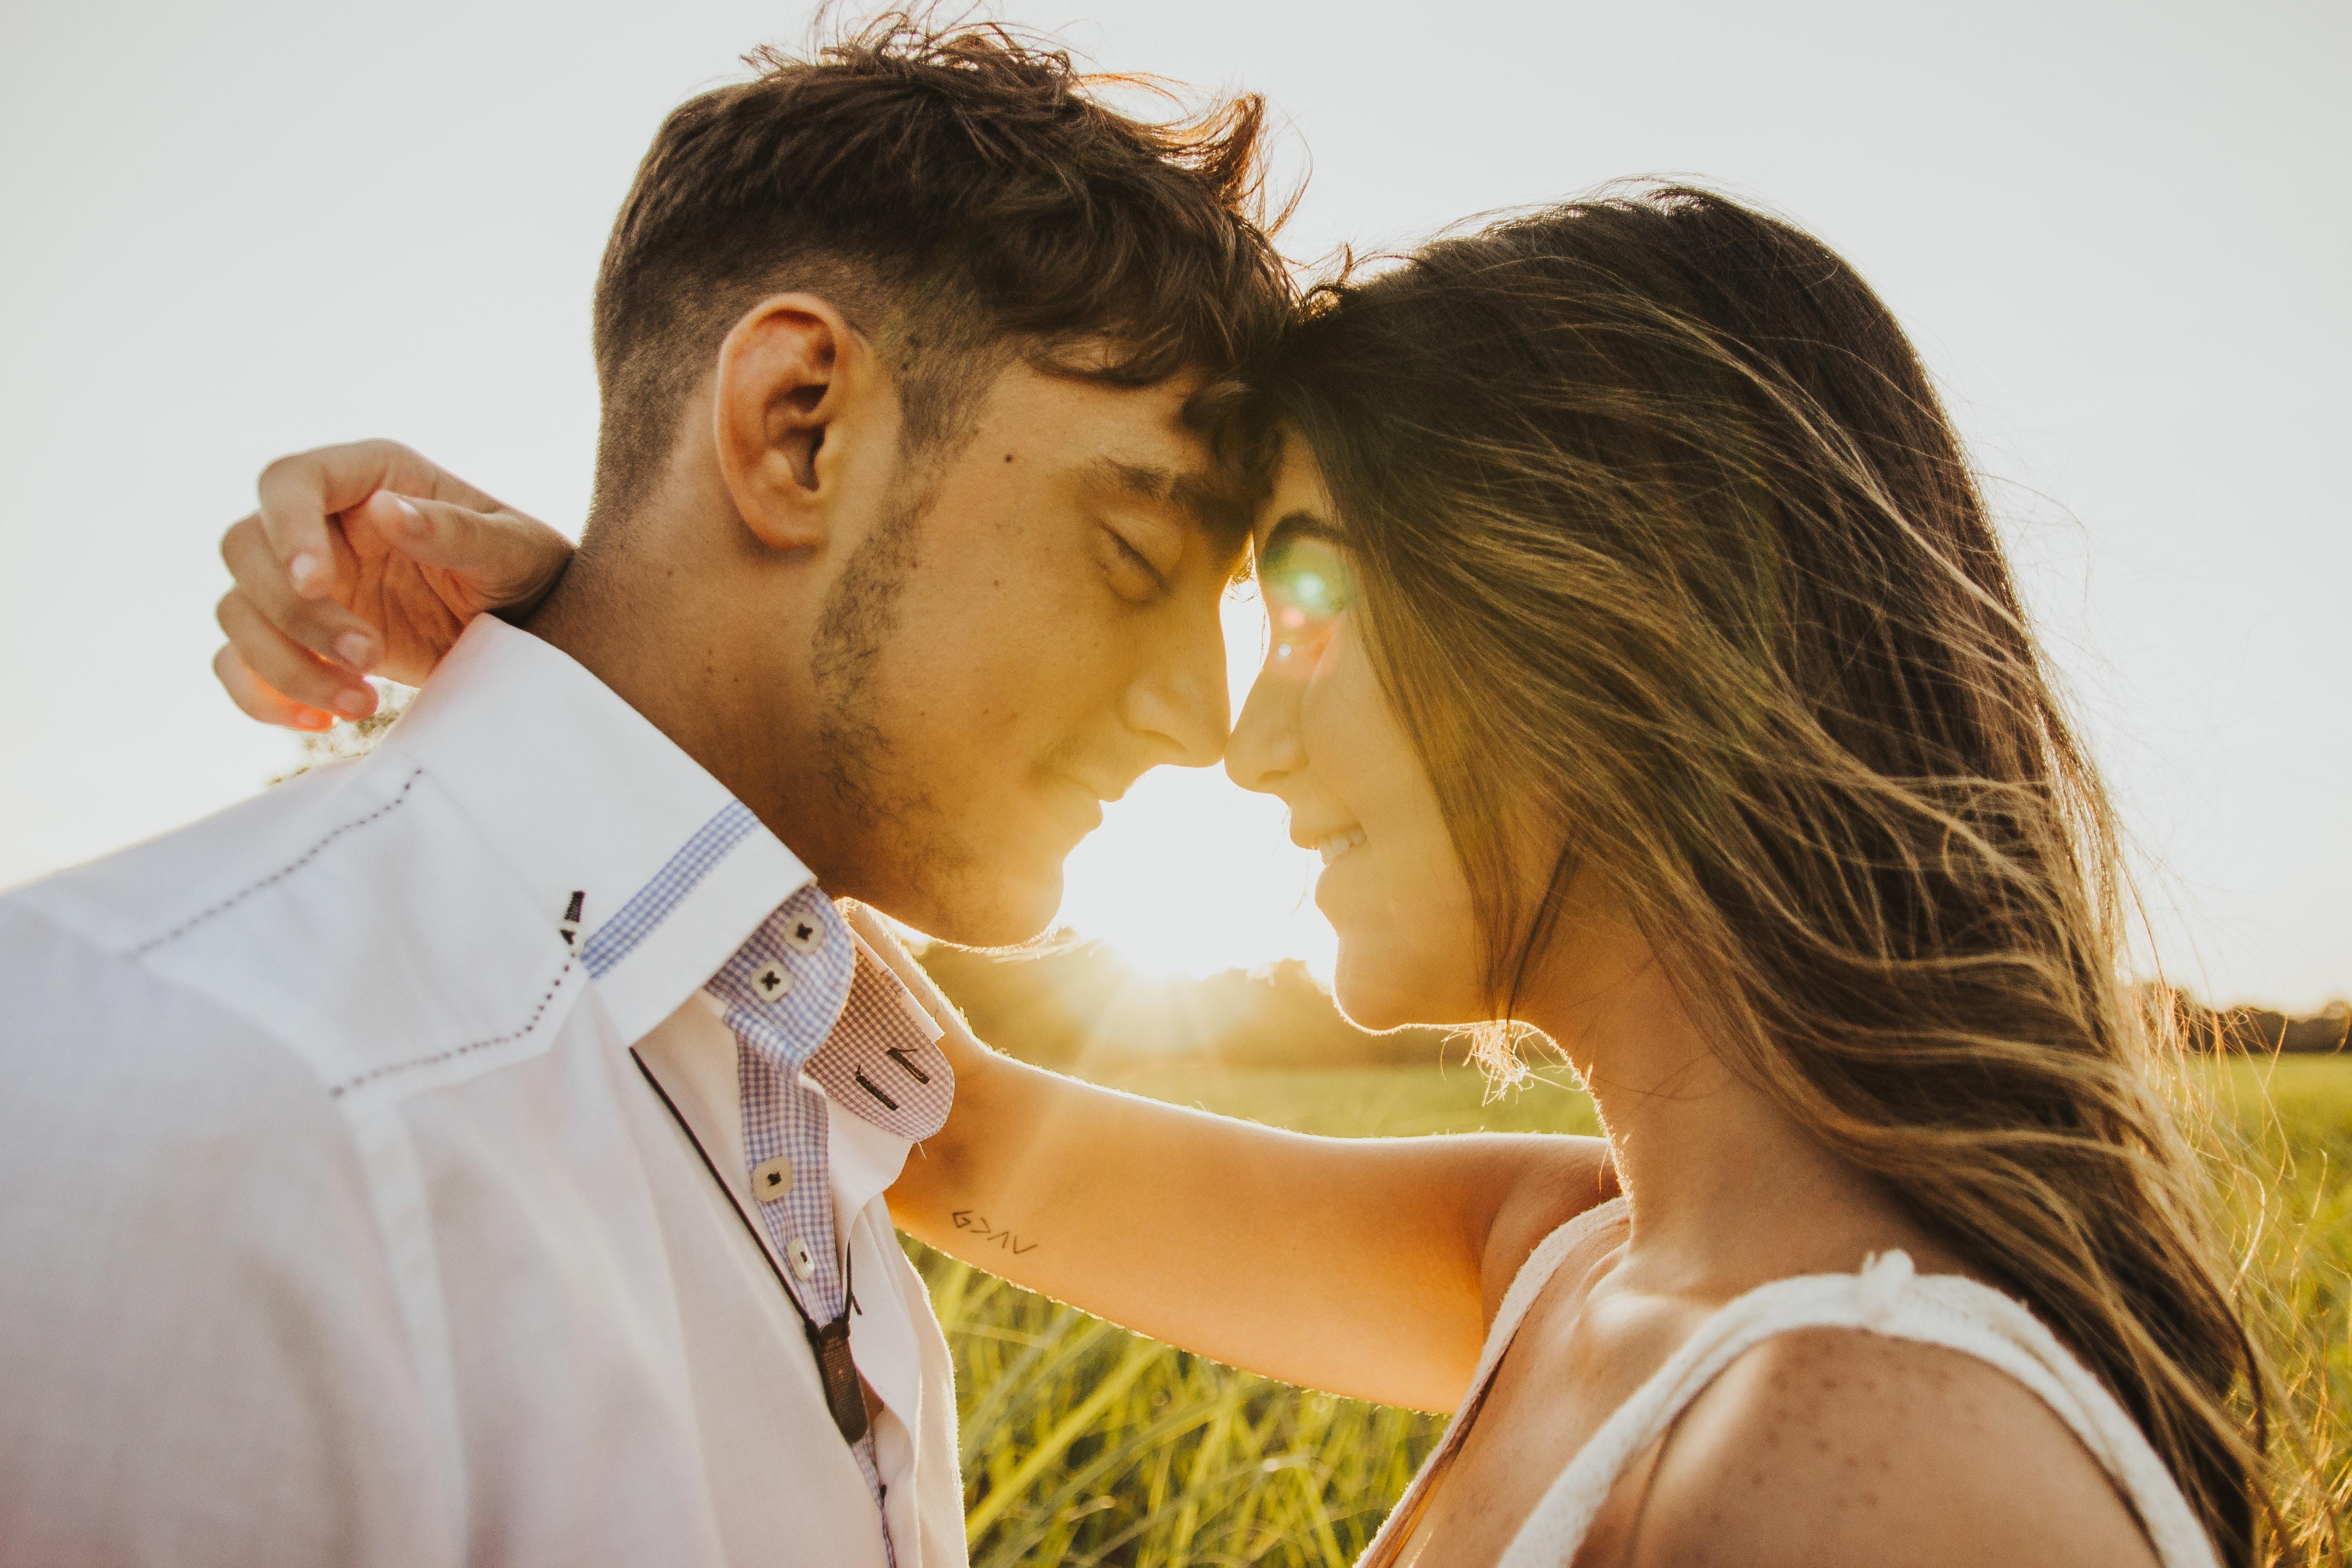 Asian dating website london